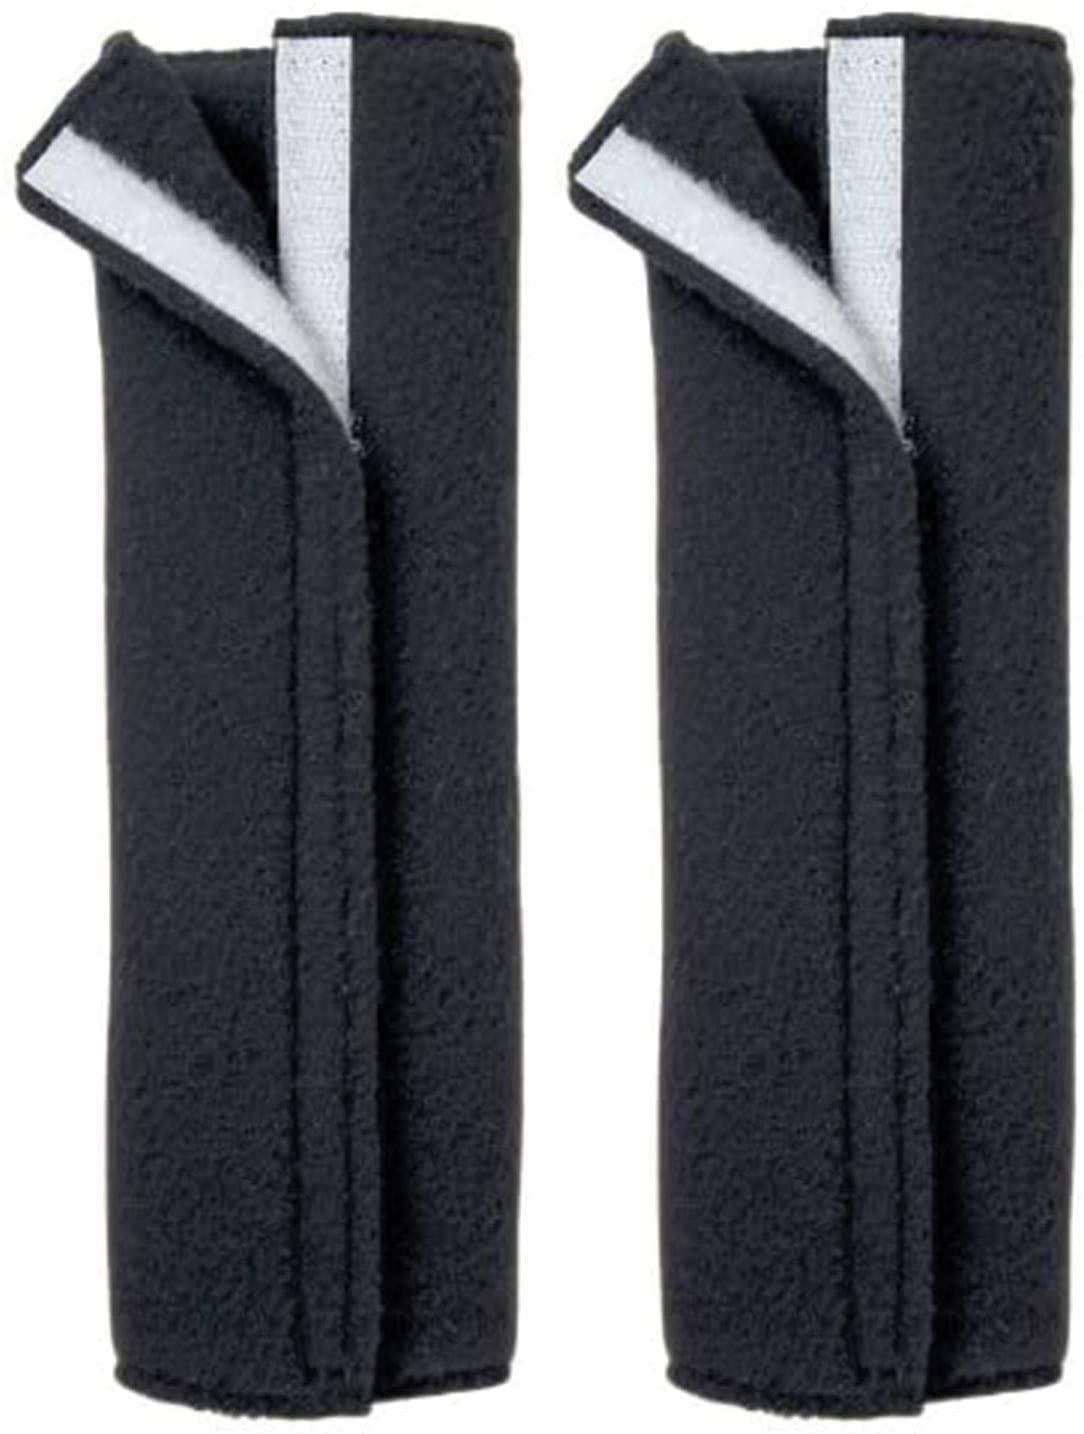 T-Rex Seatbelt Cover, Fleece Seat Belt Pad (Black (2-Pack))